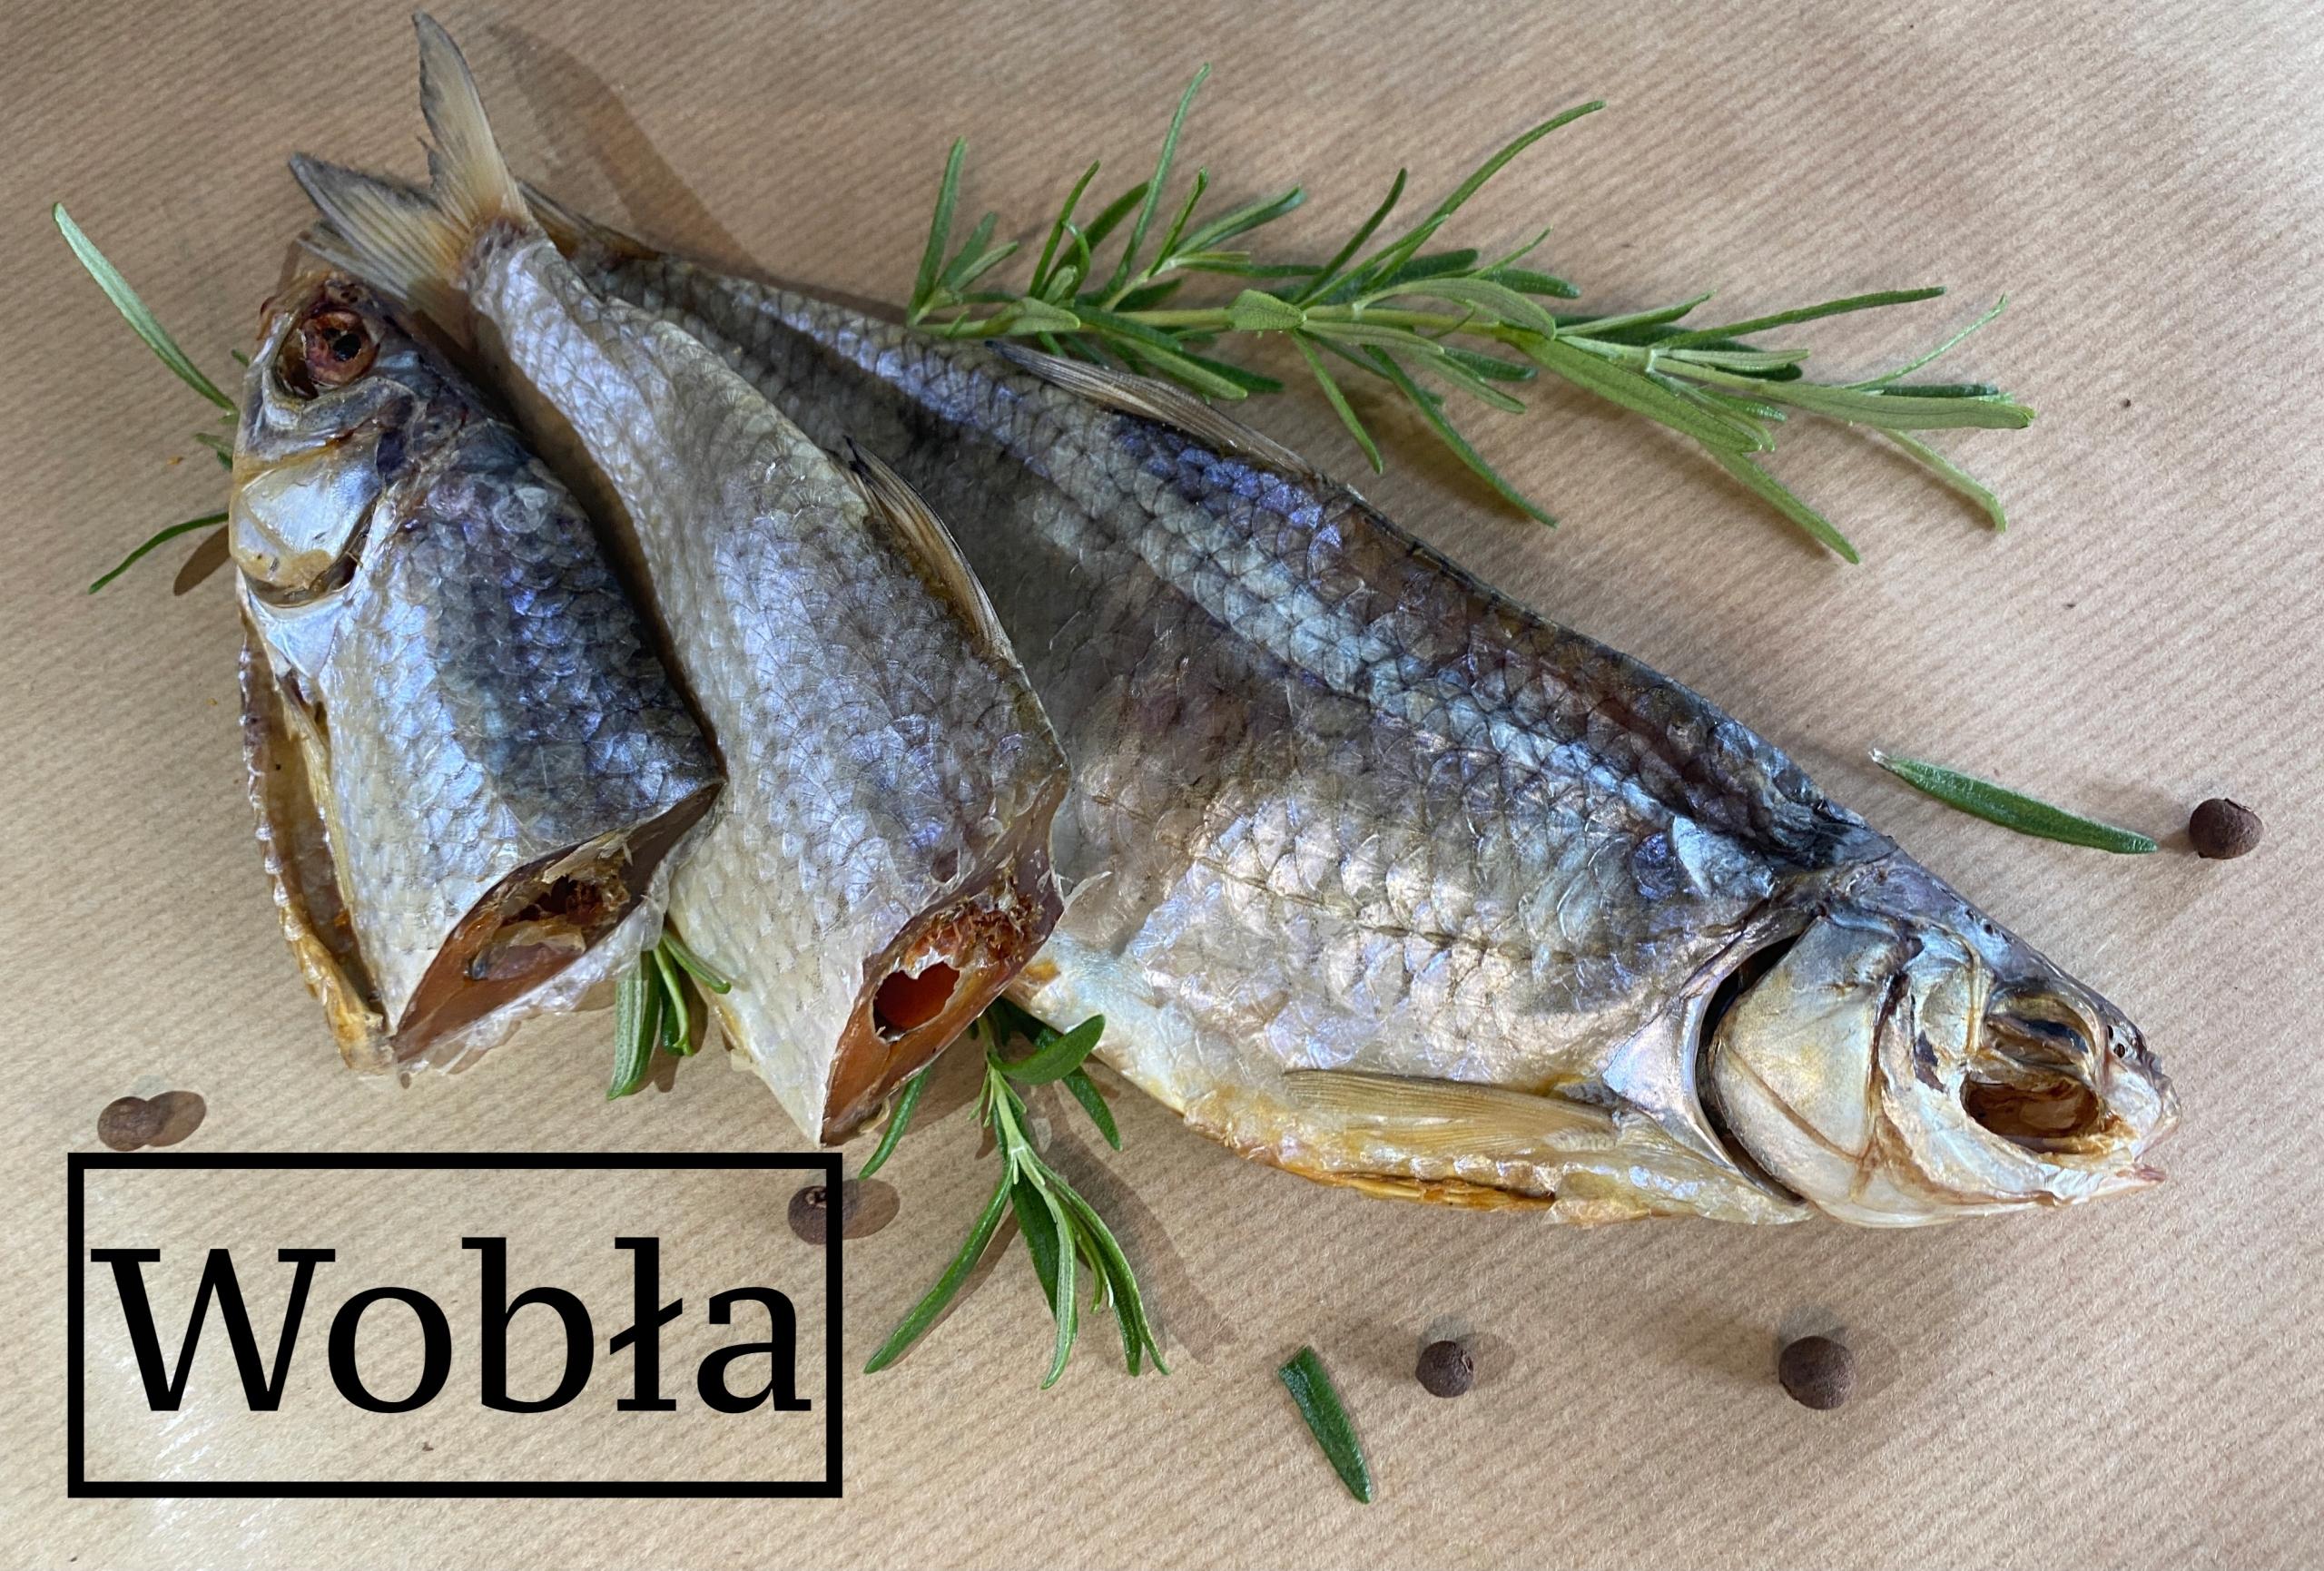 Вобла (каспийская плотва) Сушеная рыба 1 кг +/- 10 г x5 шт.